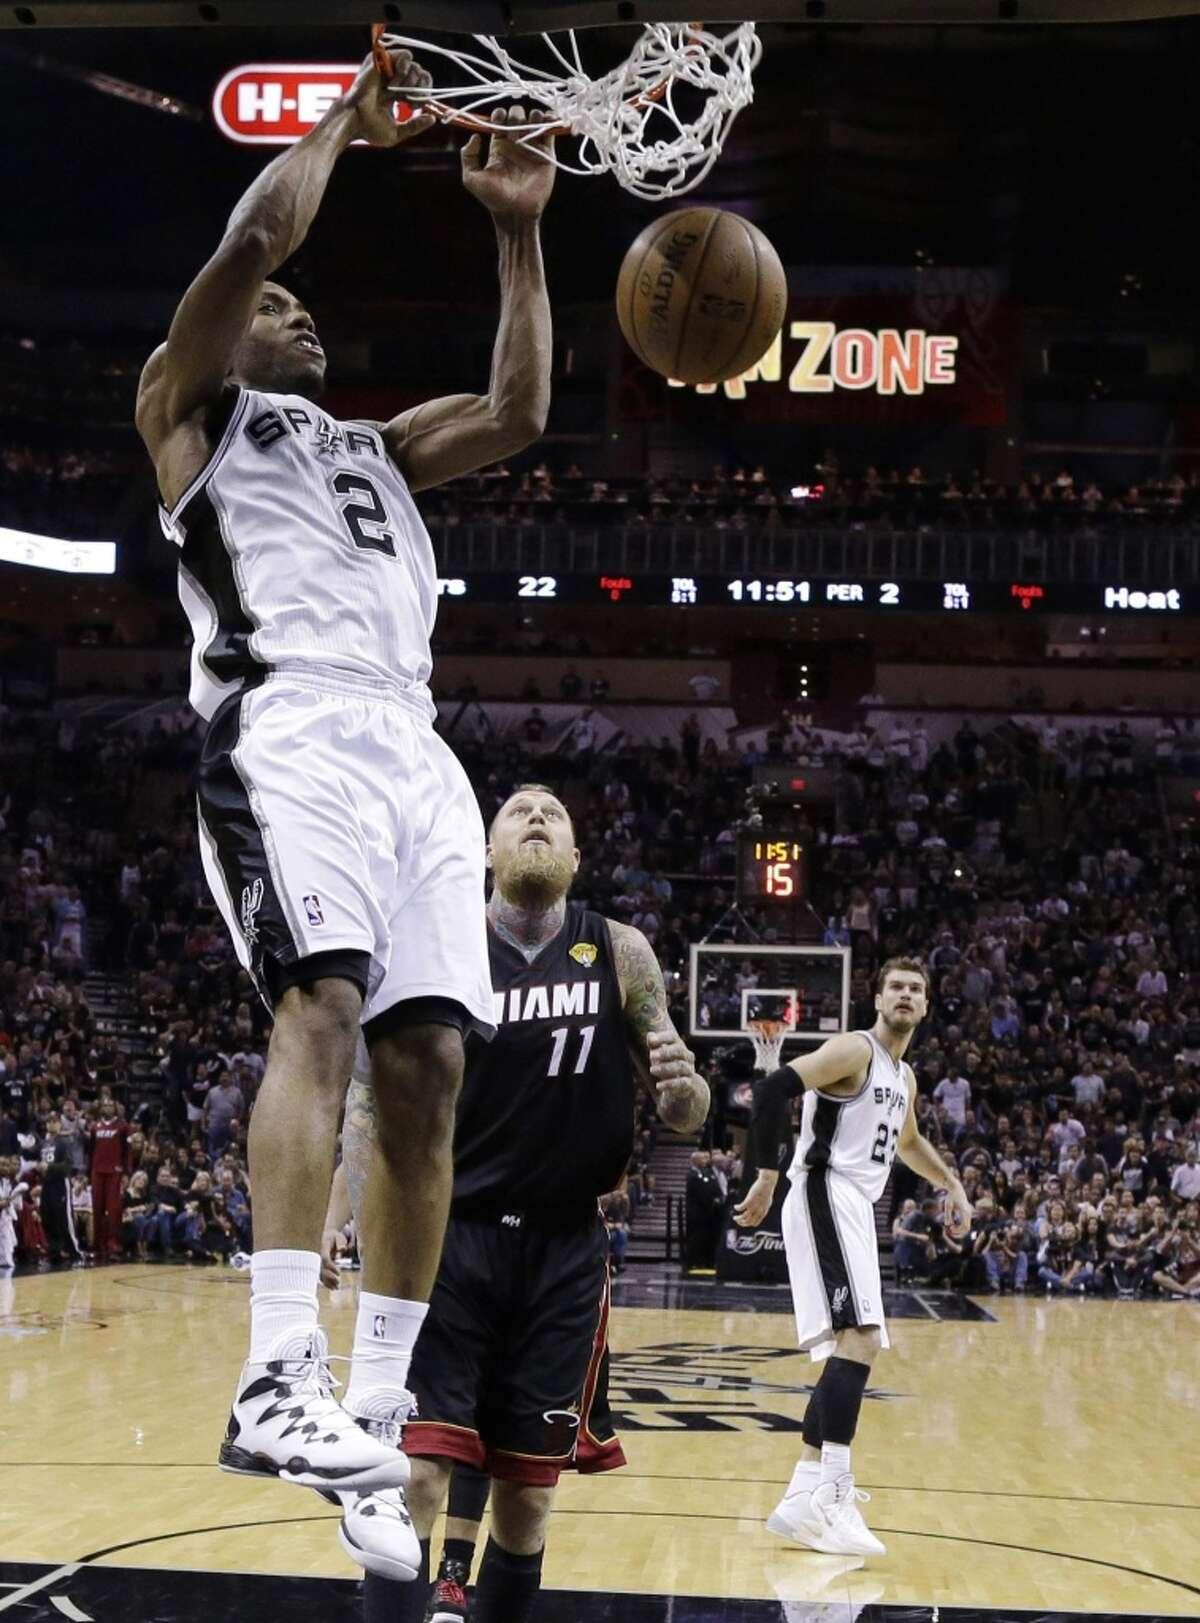 24. Kawhi Leonard Team: San Antonio Spurs Position: Small forward 2013-14Stats: 15.8 PPG, 7.7 RPG, 2.5 APG, 2.1 SPG